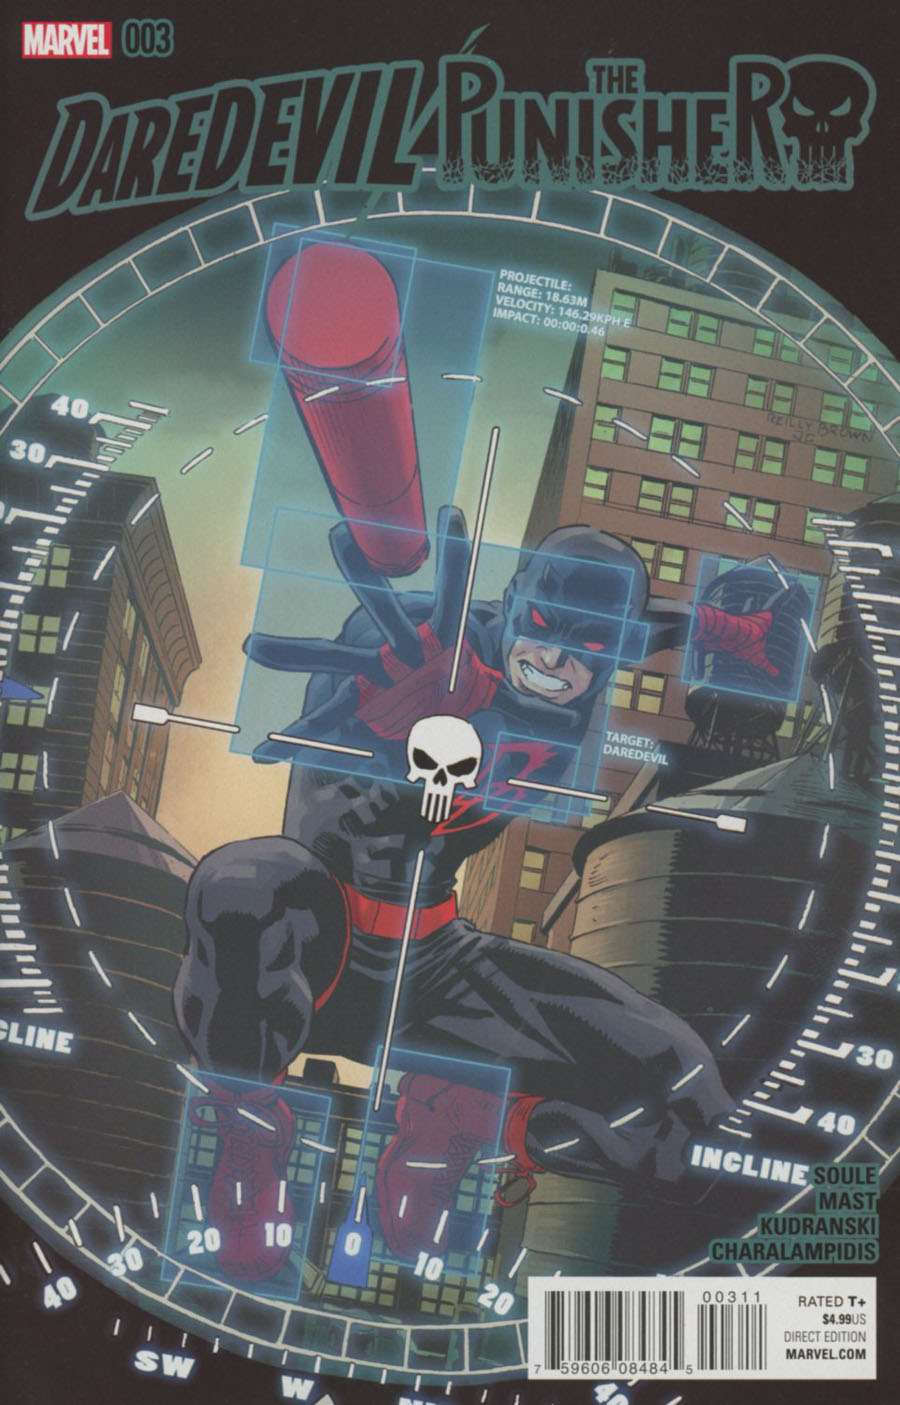 Daredevil Punisher #3